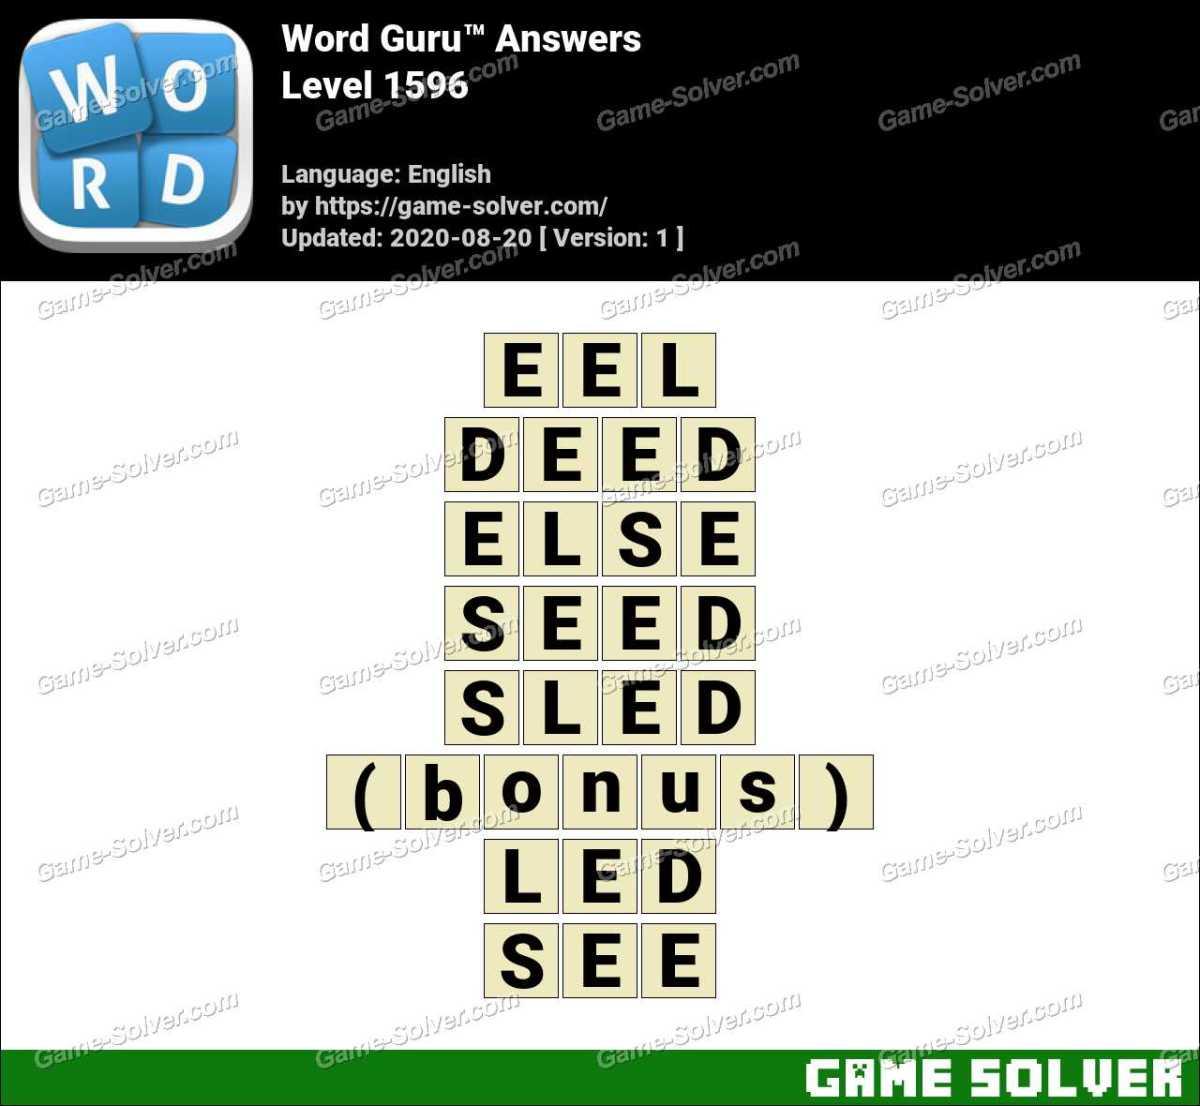 Word Guru Level 1596 Answers